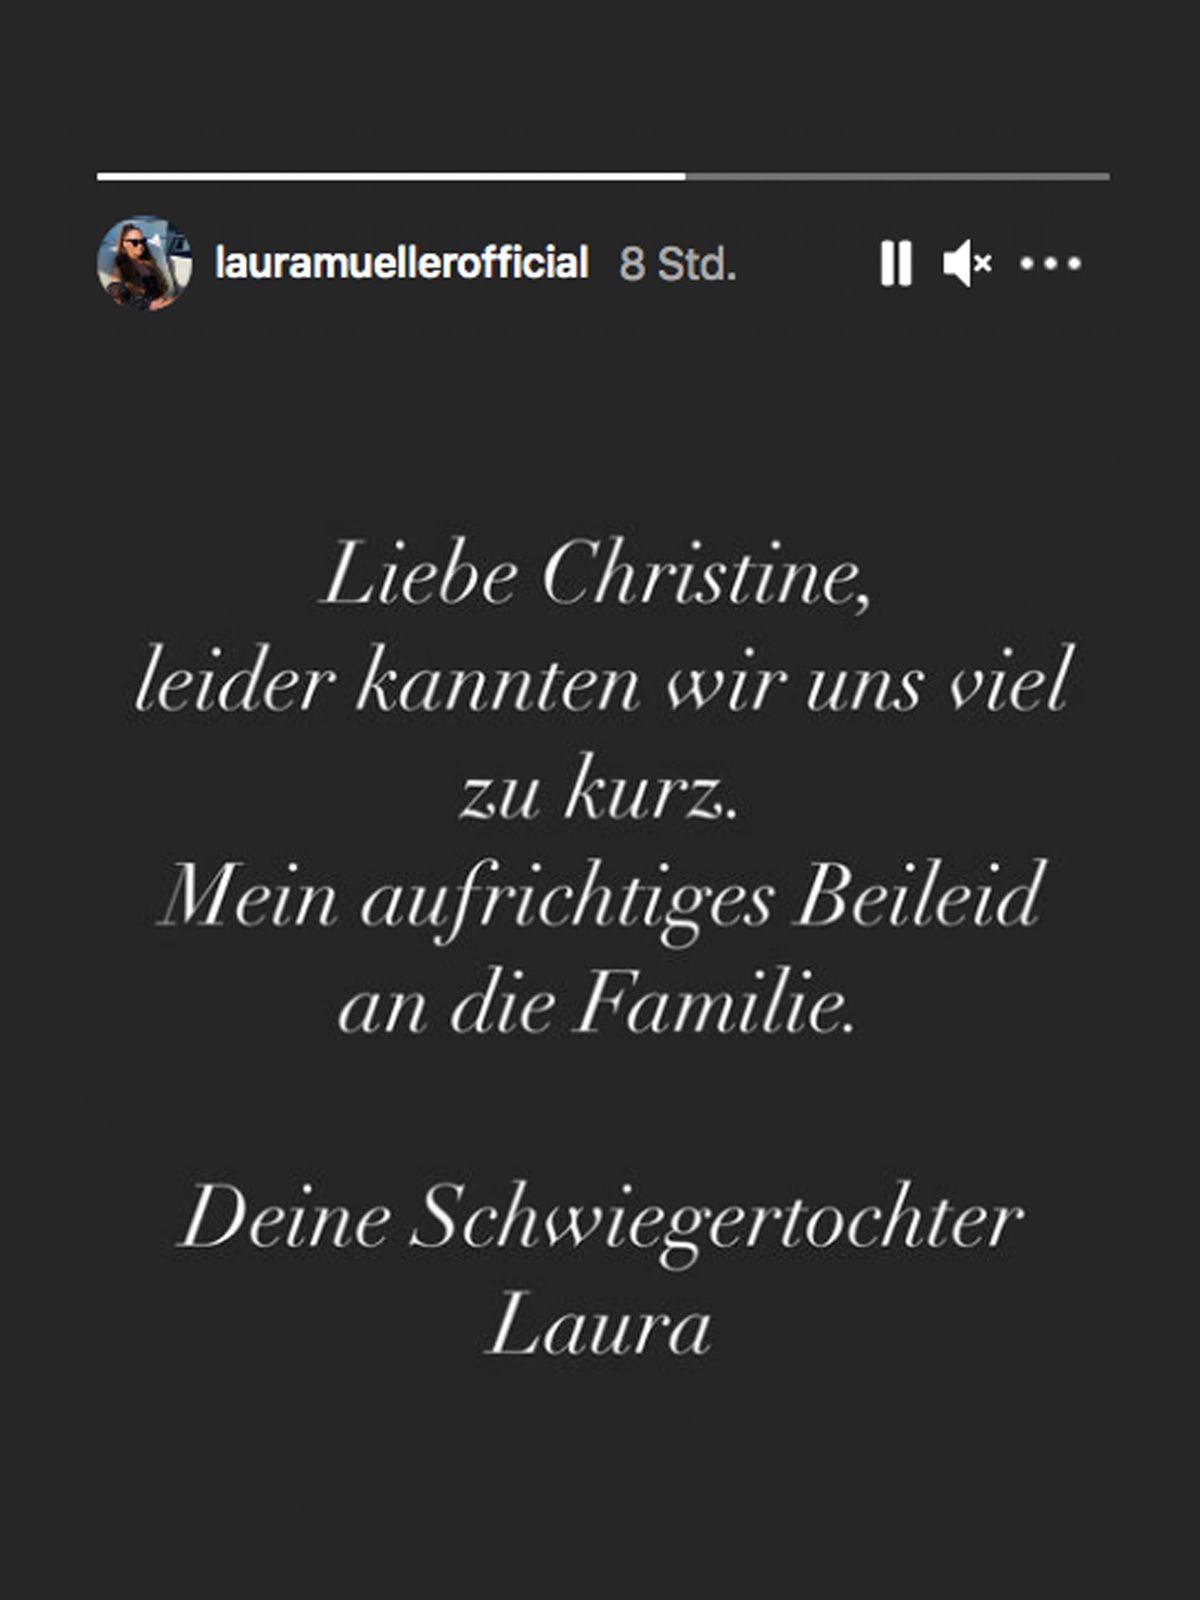 Laura Müller zum Tod der Wendler-Mutter